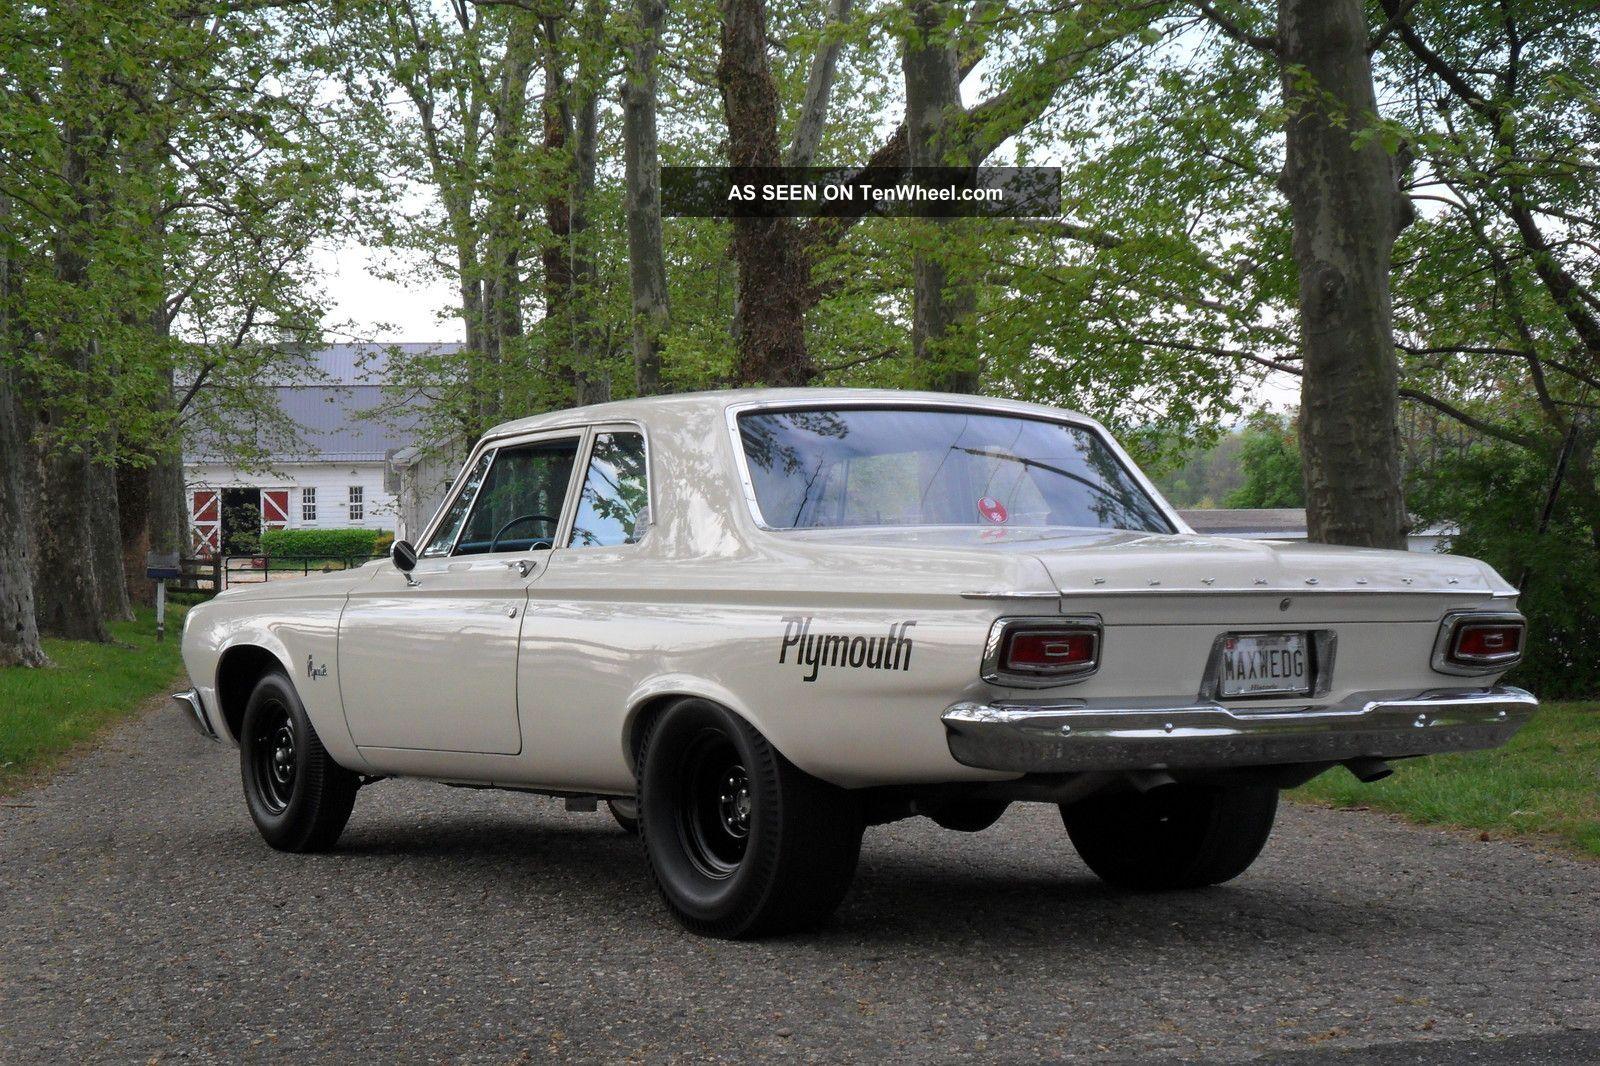 1964 Plymouth Savoy Max Wedge 2door Sedan Post Stock